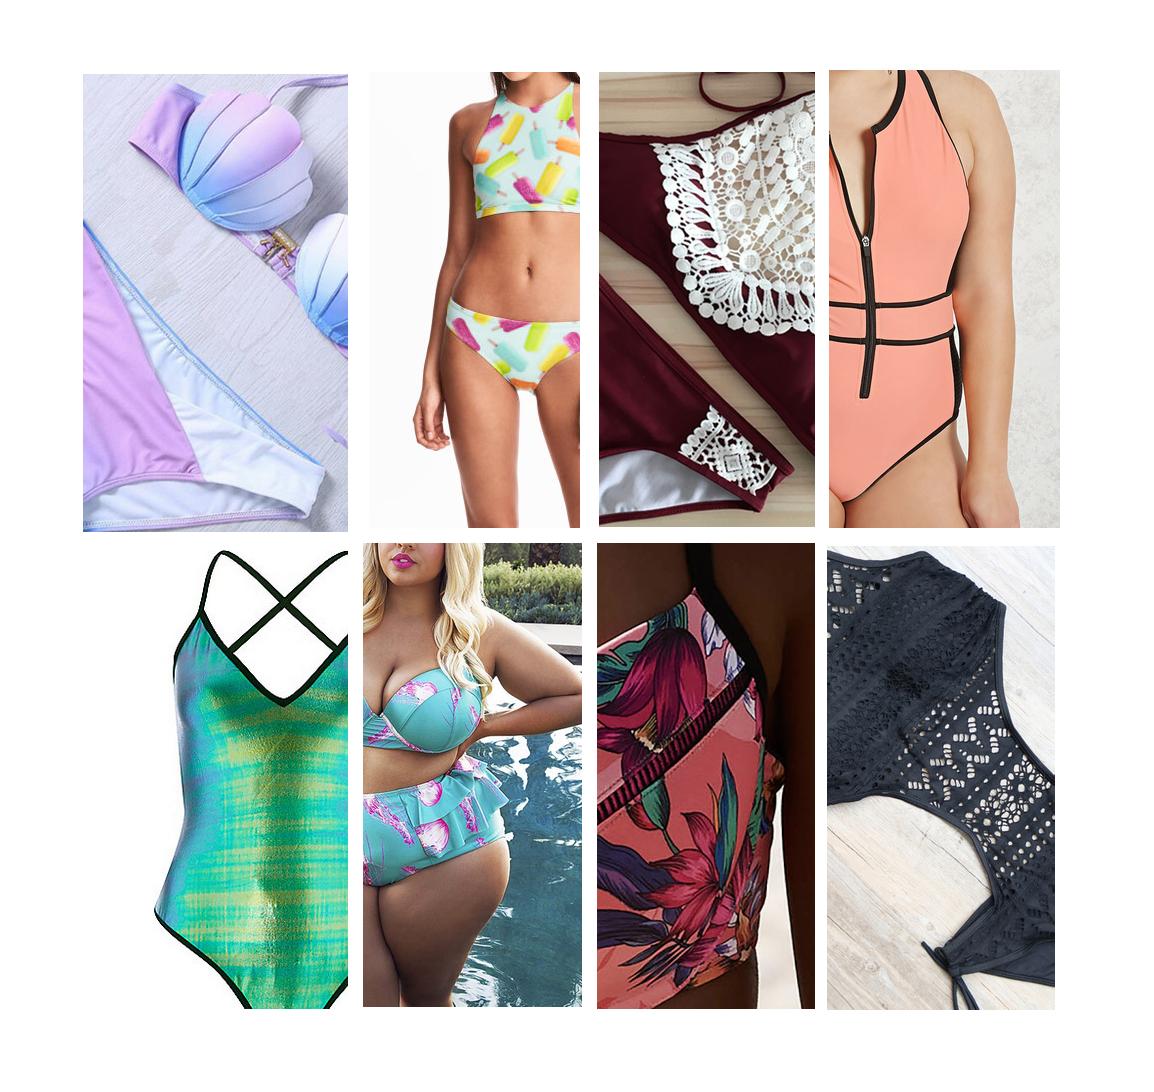 Bikini's en badpakken in alle soorten, maten en prijscategorieën